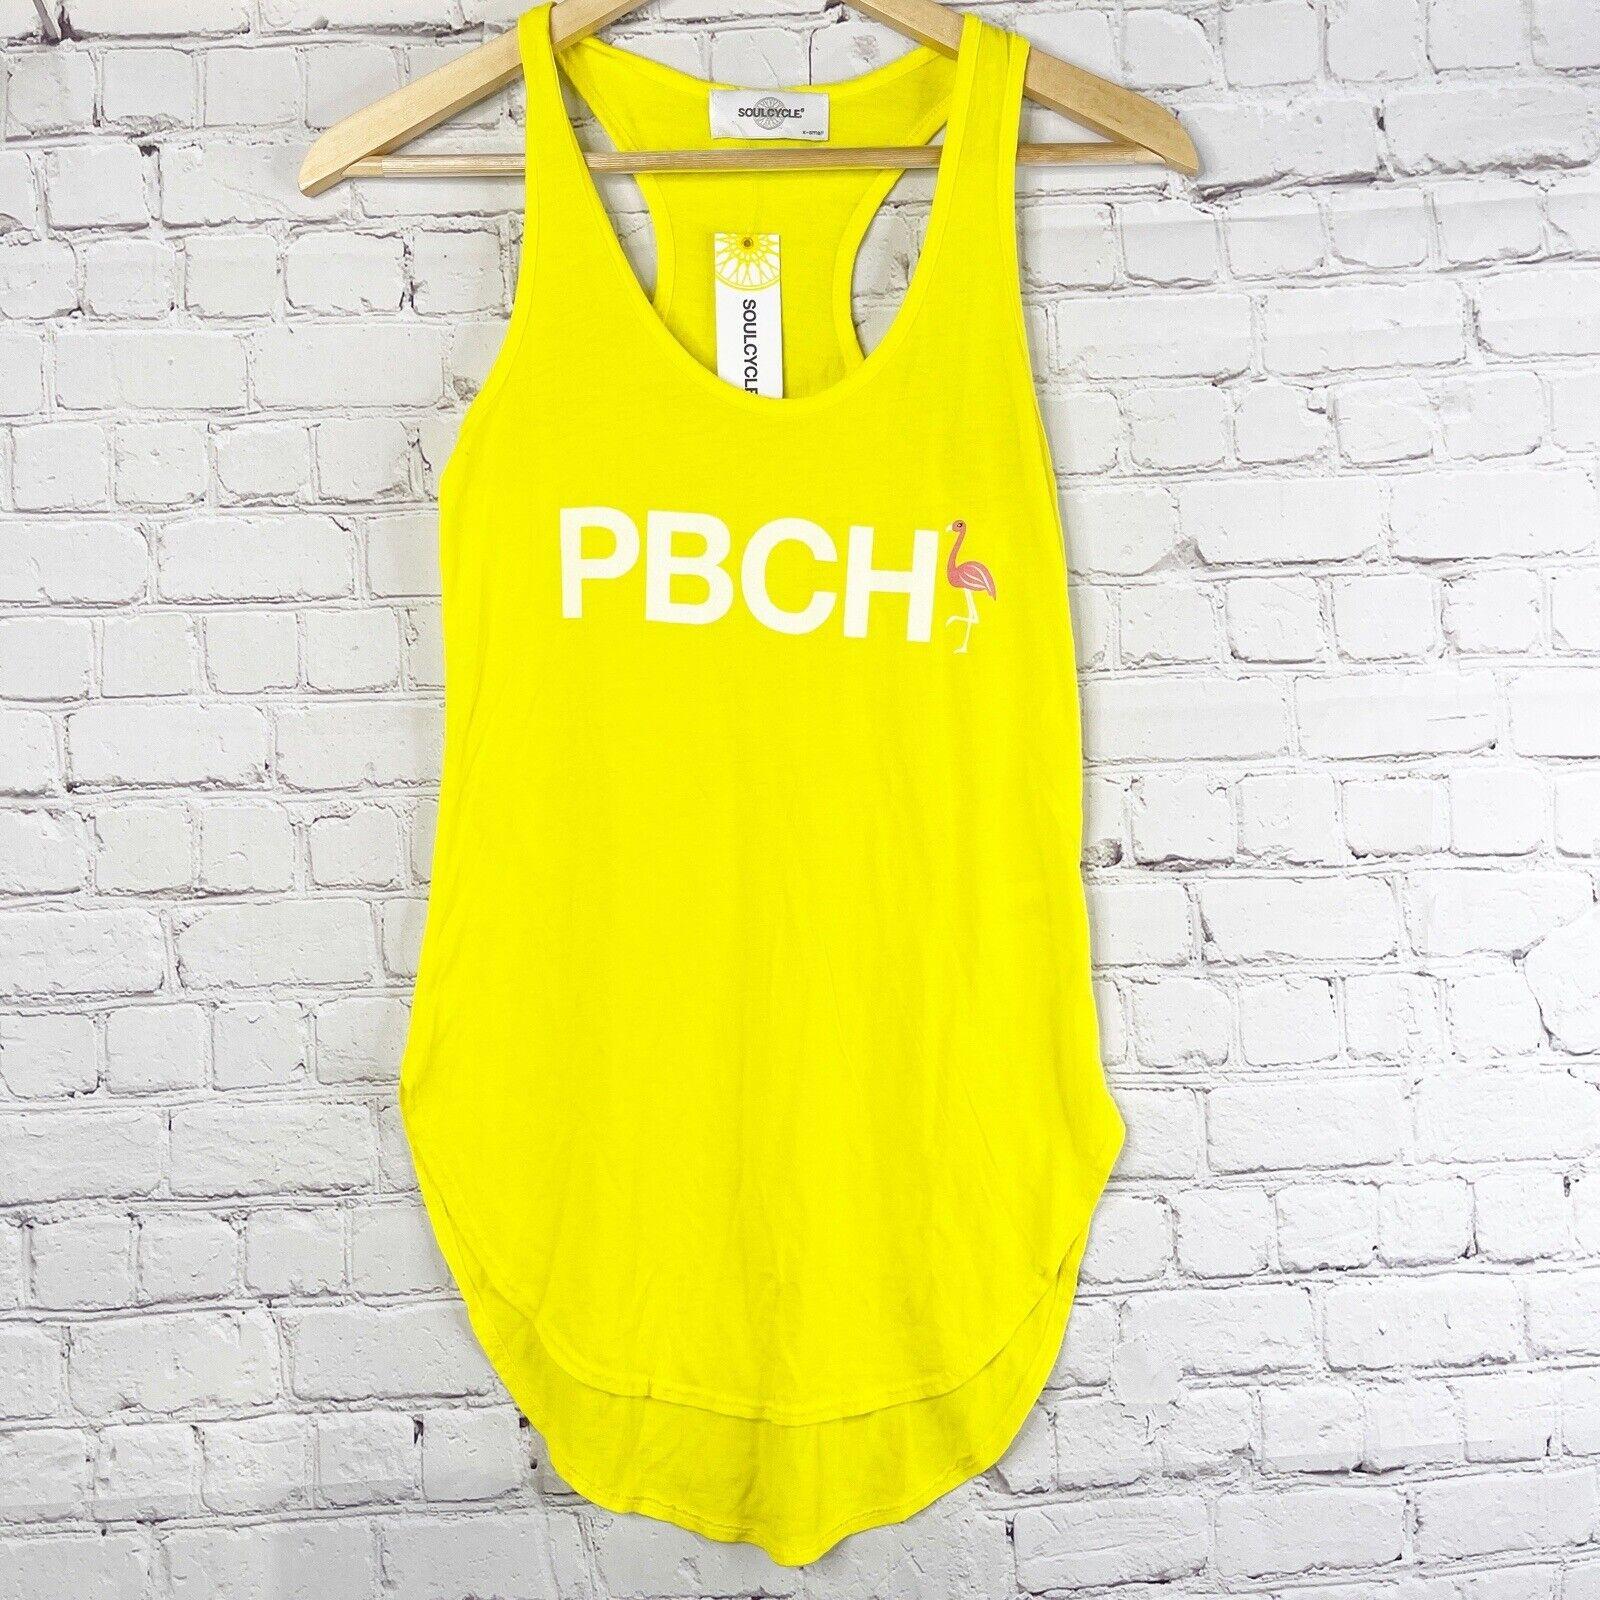 SOULCYCLE Bright Yellow Flamingo PCBH Workout Tank Women's XS